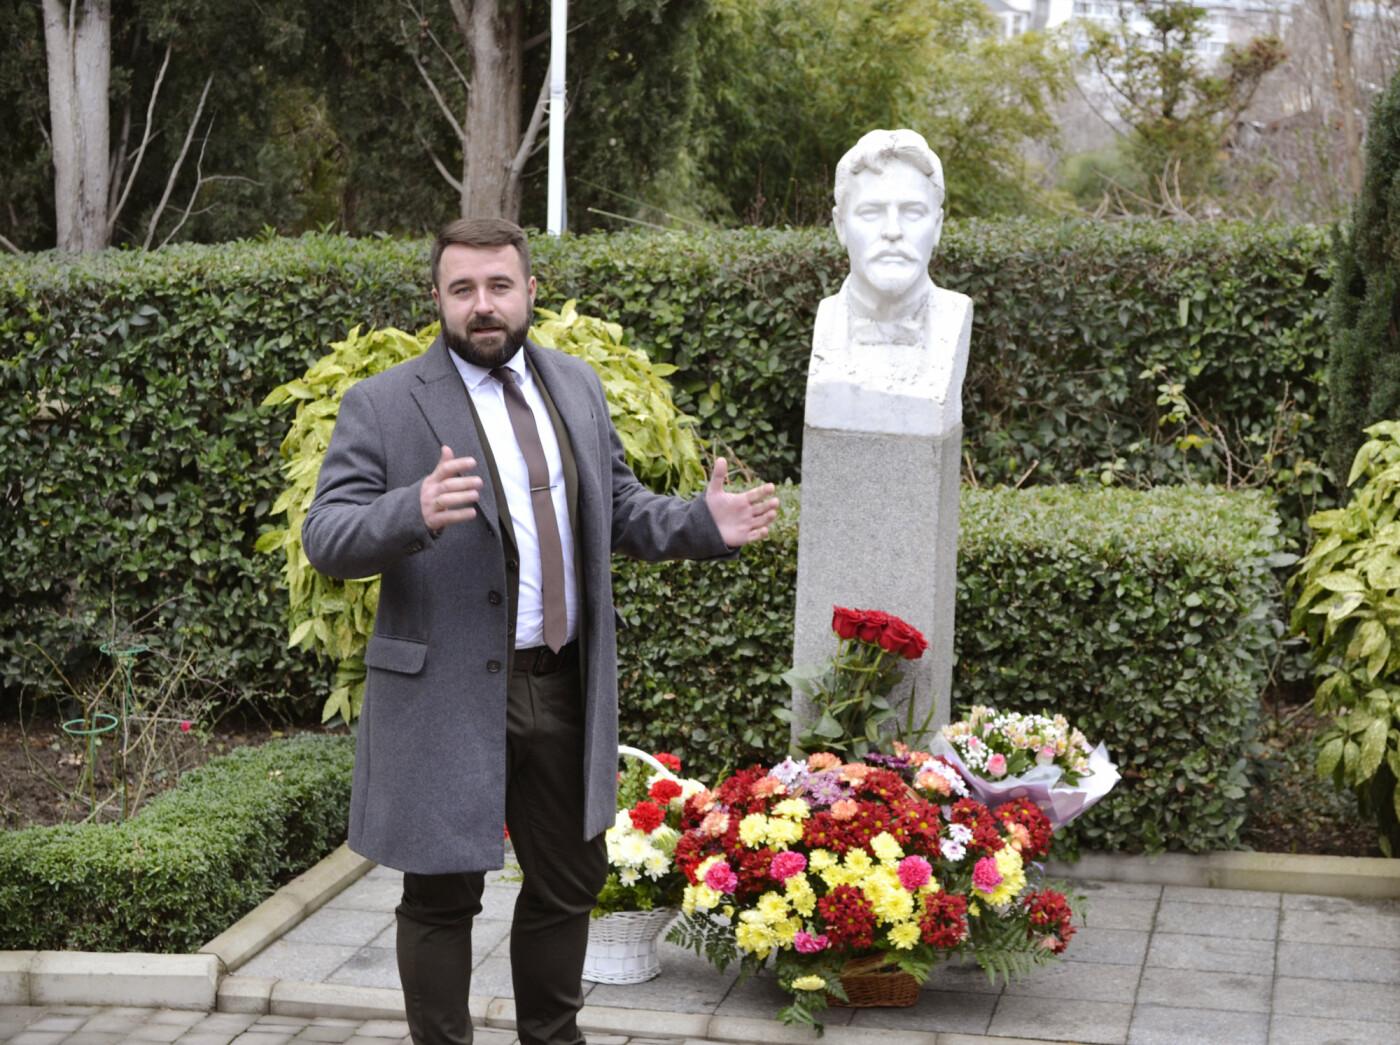 Как Ялта отметила 160 лет со дня рождения Антона Павловича Чехова, фото-6